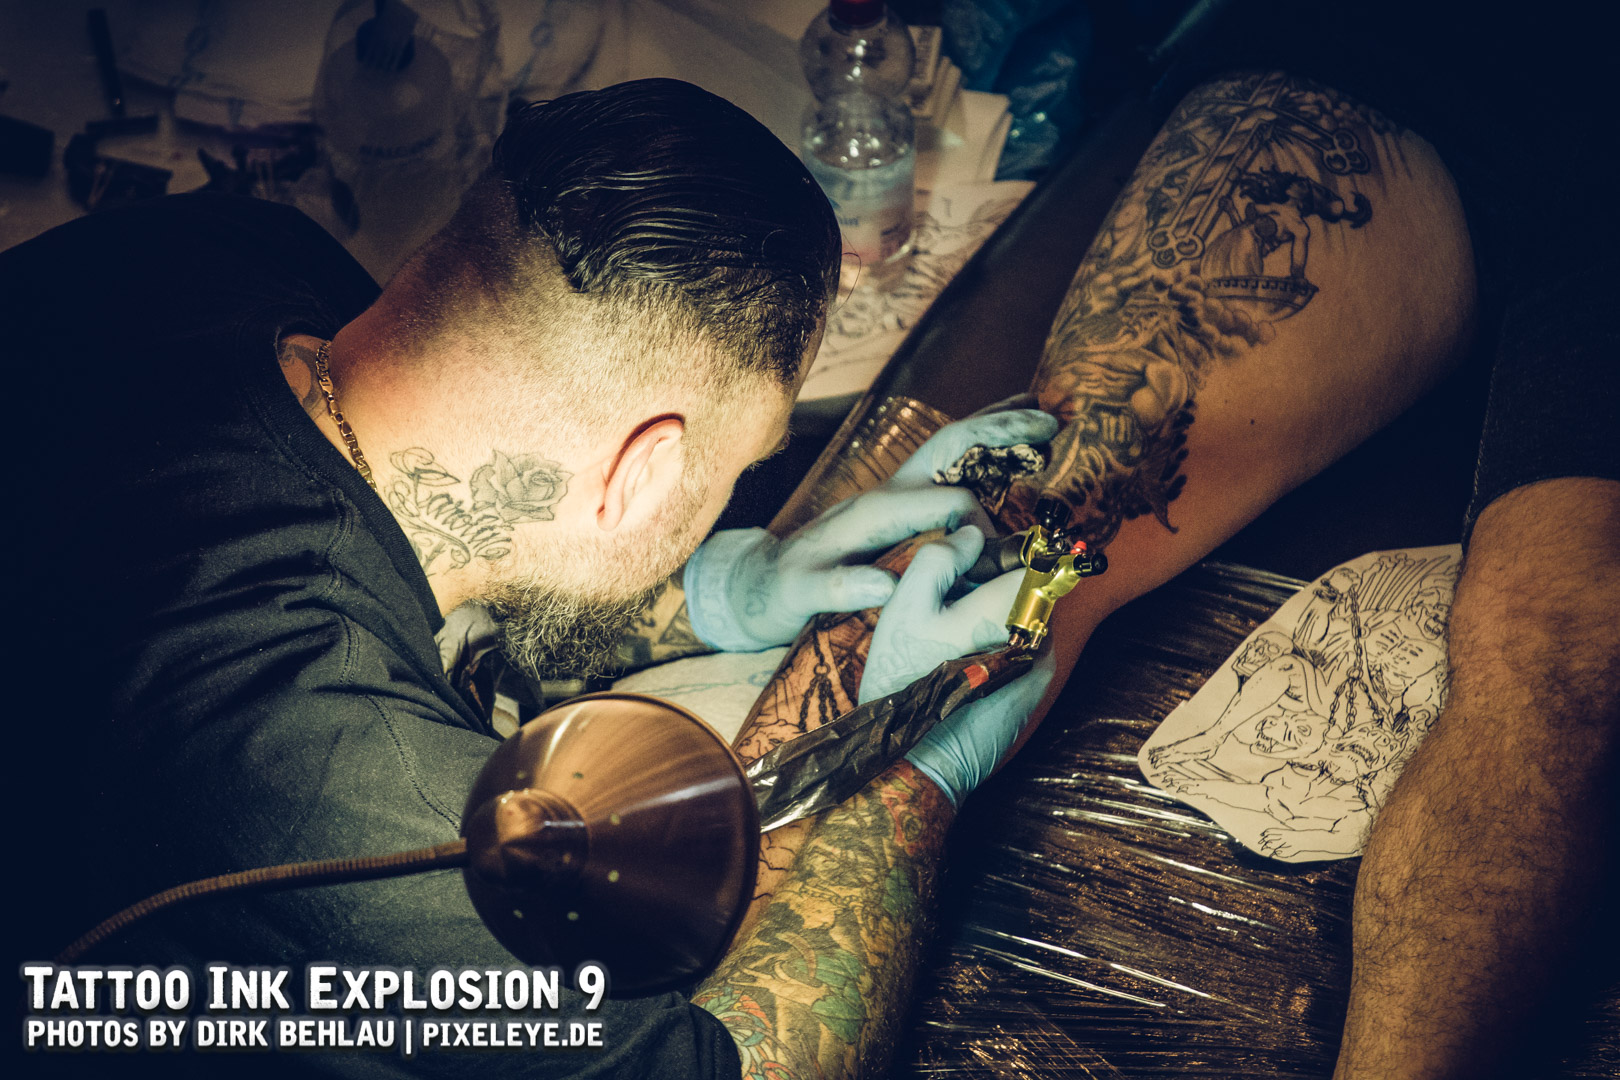 Tattoo Ink Explosion 2018 WEB by Dirk Behlau-1406.jpg